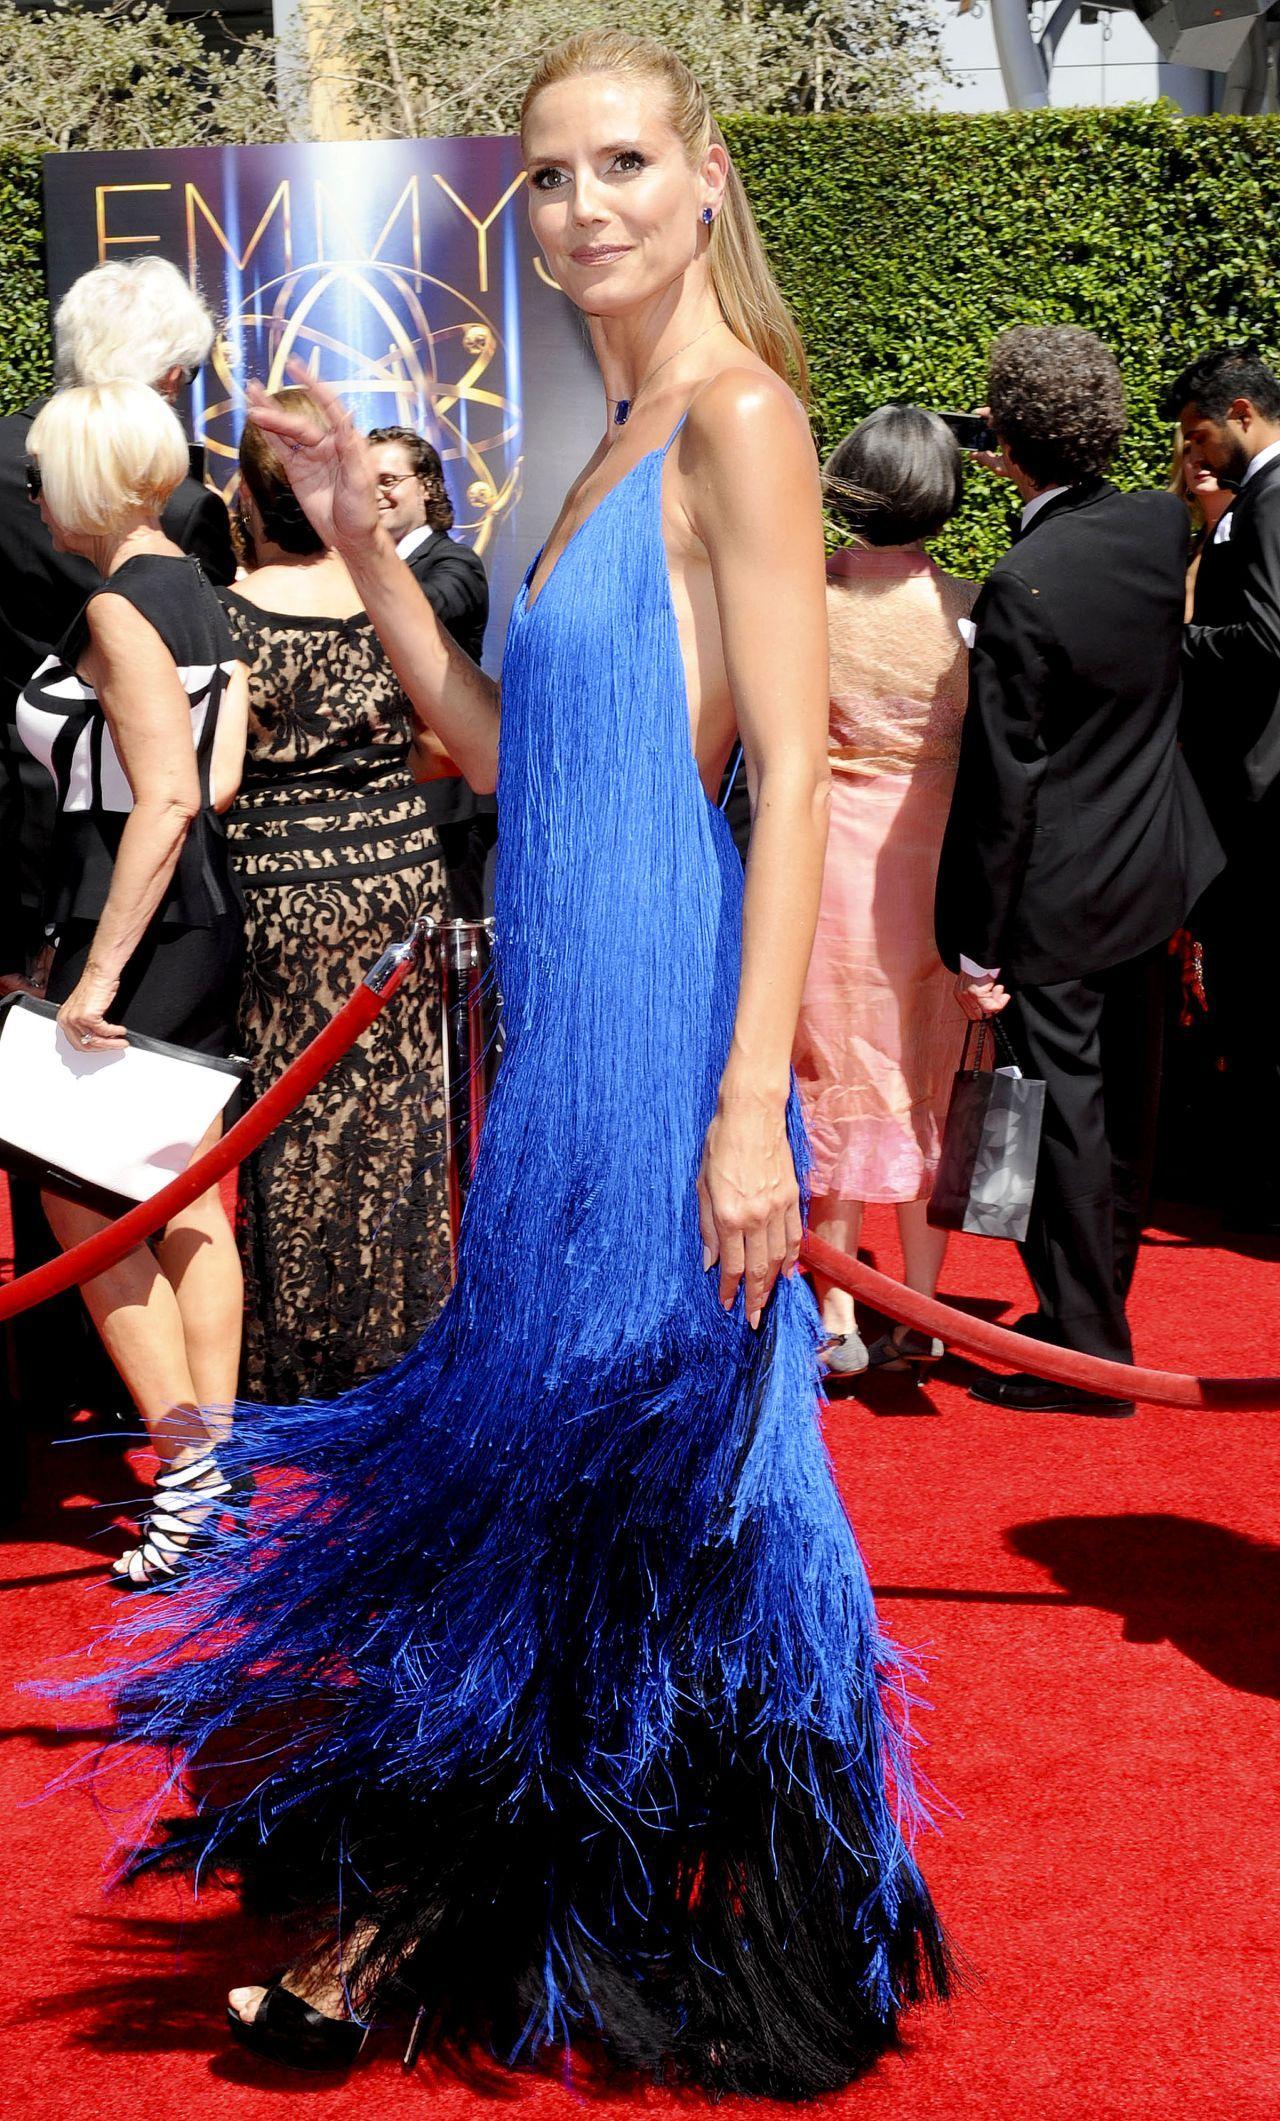 Lyndsay Tapases Blue Dress - Year of Clean Water